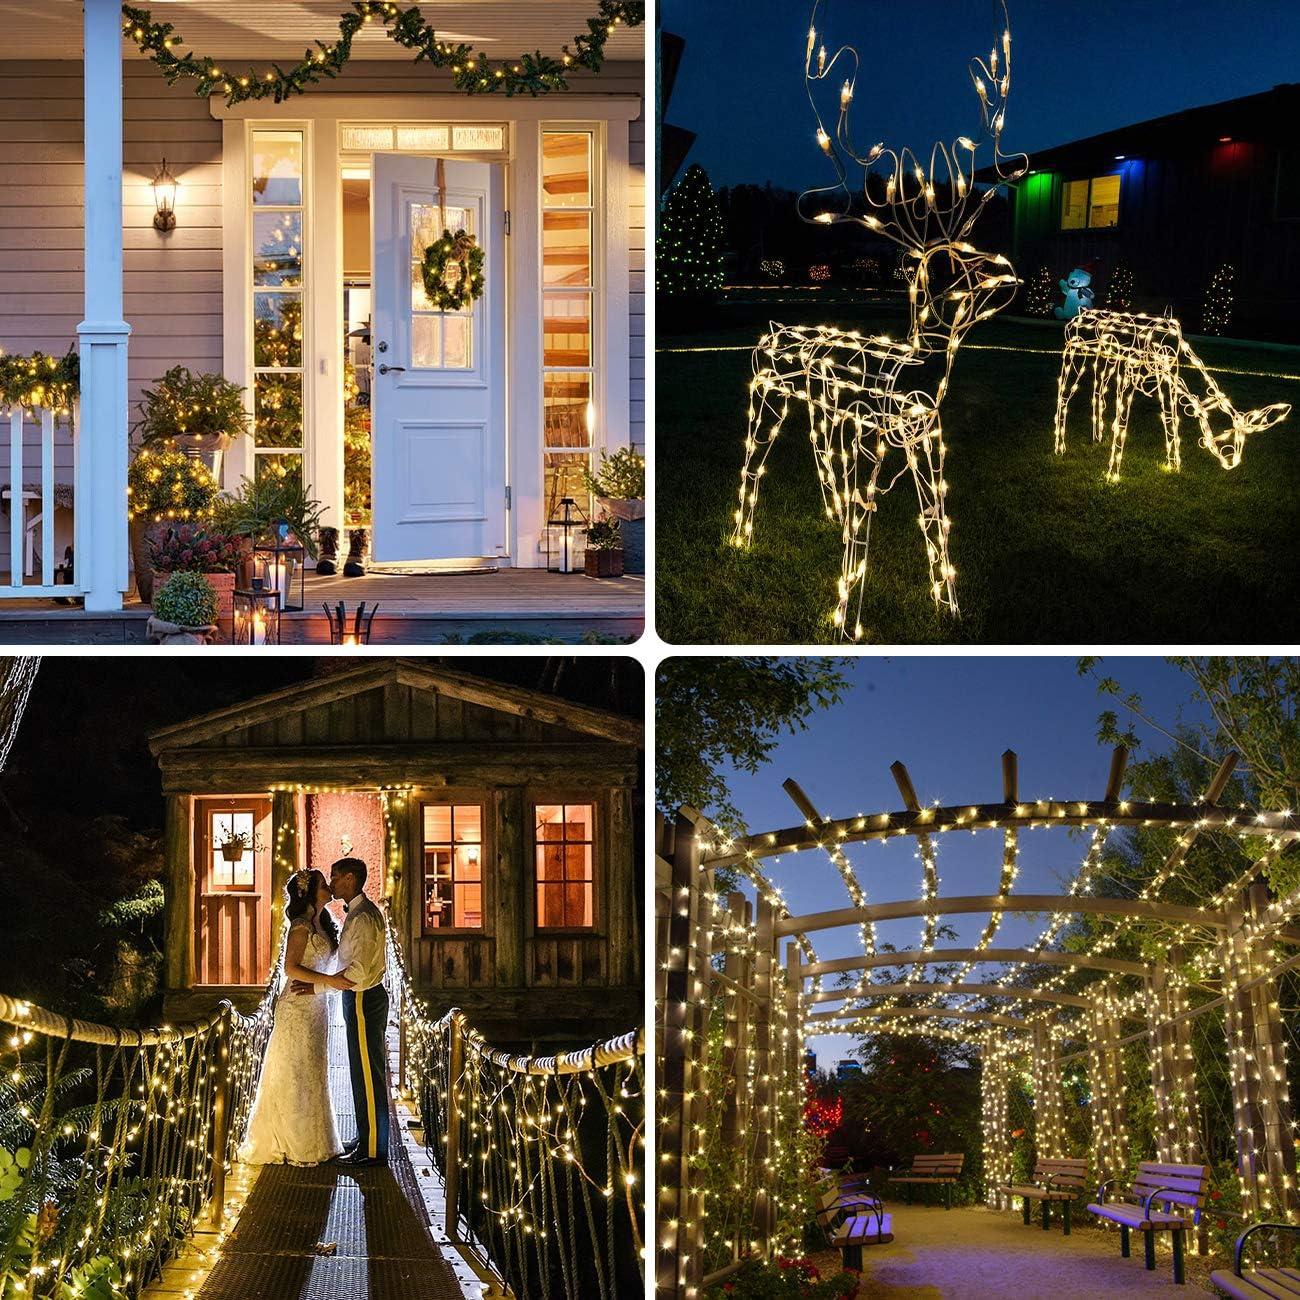 mejor decoracion navideña barata